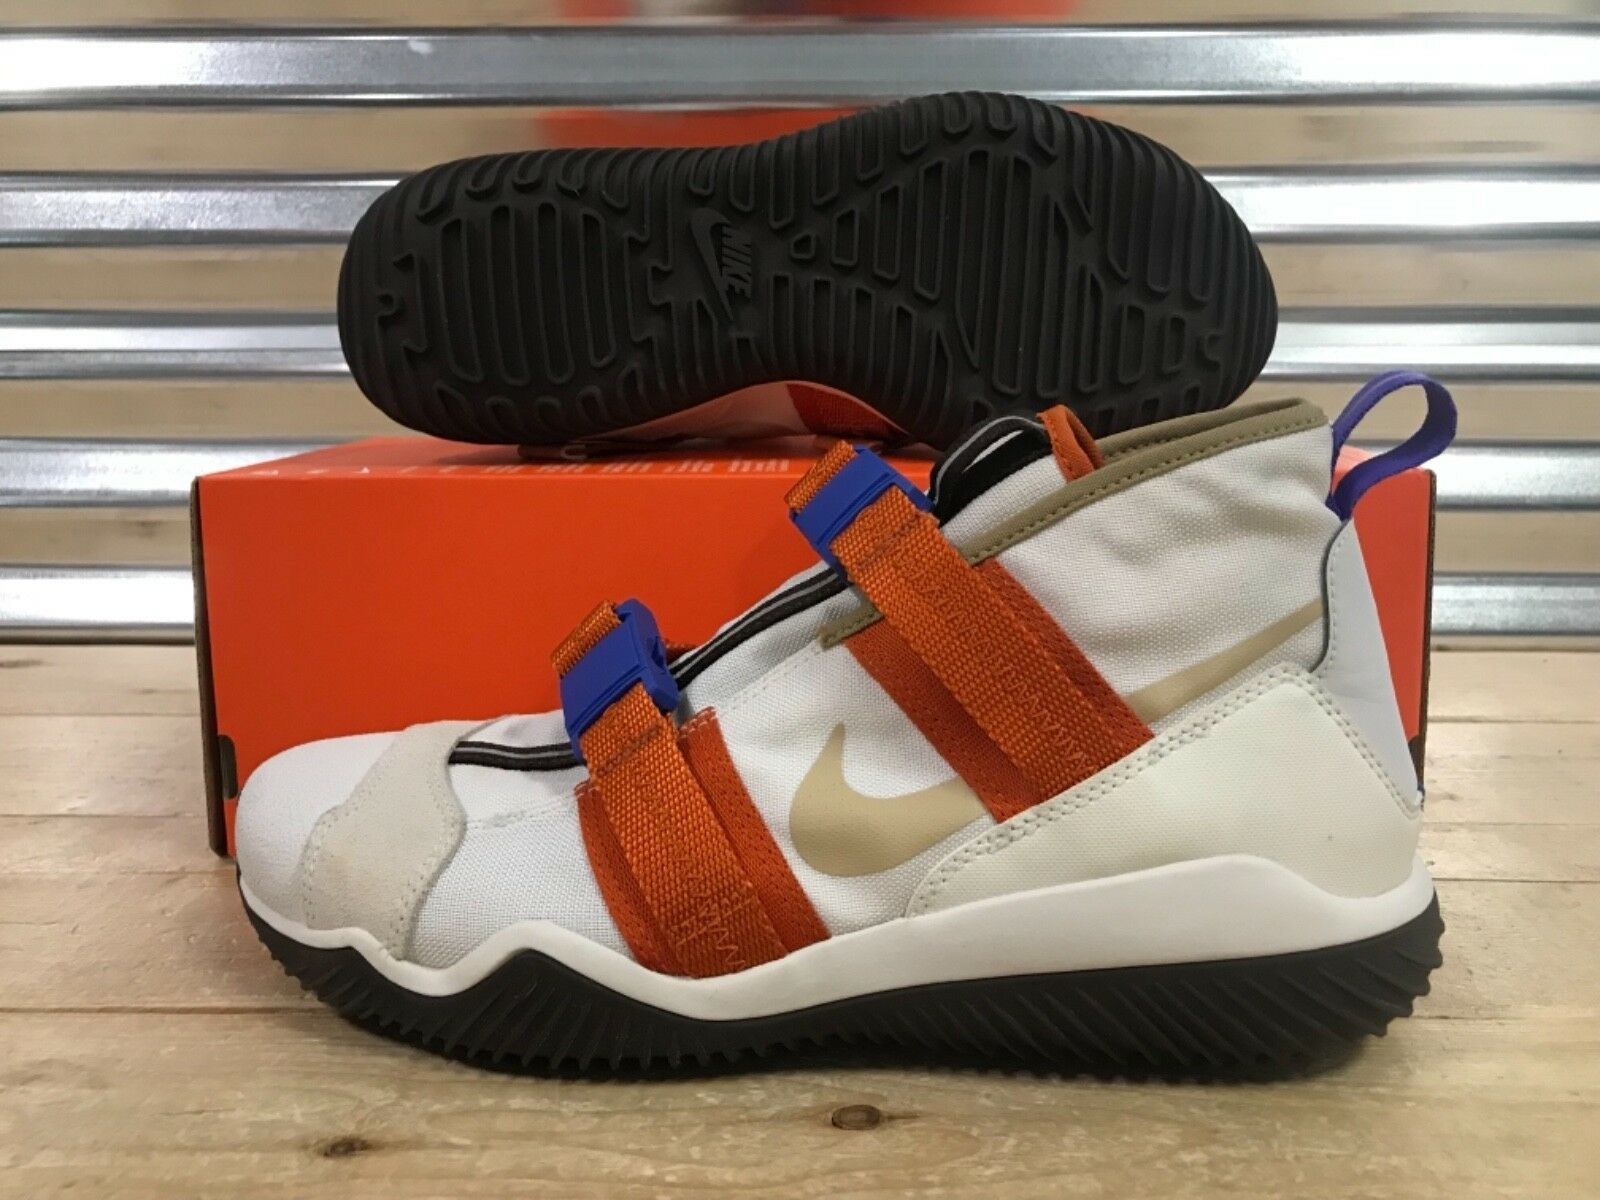 Nike KMTR Komyuter Komyuter Komyuter Lifestyle Sample shoes Khaki orange Tan SZ 9 ( AO3629-001 ) c6f019